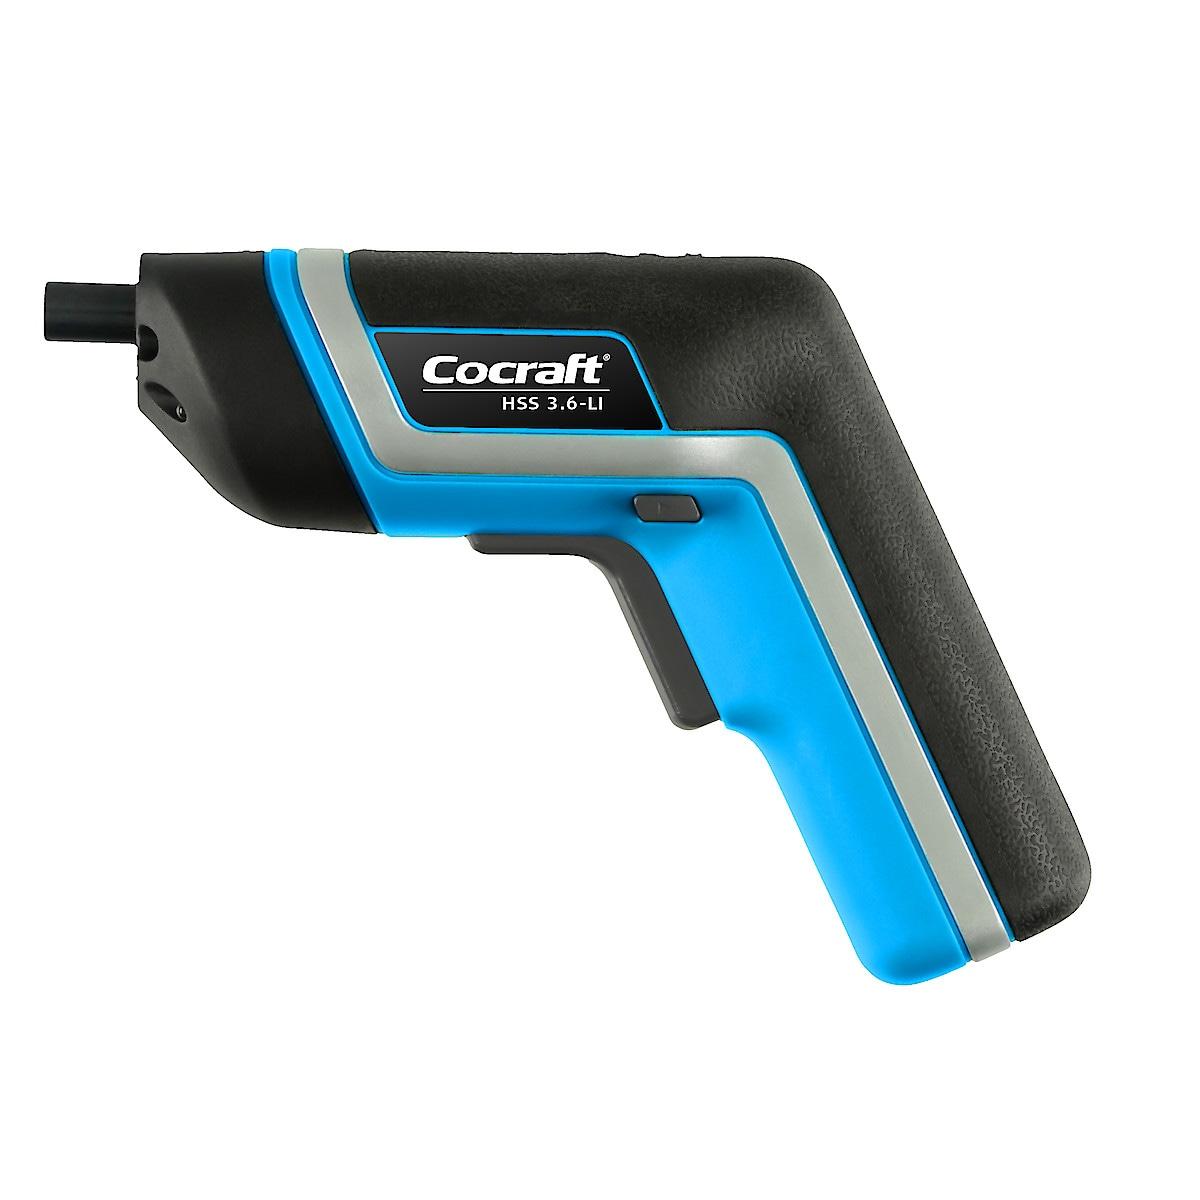 Cocraft HSS 3.6-LI Cordless Screwdriver